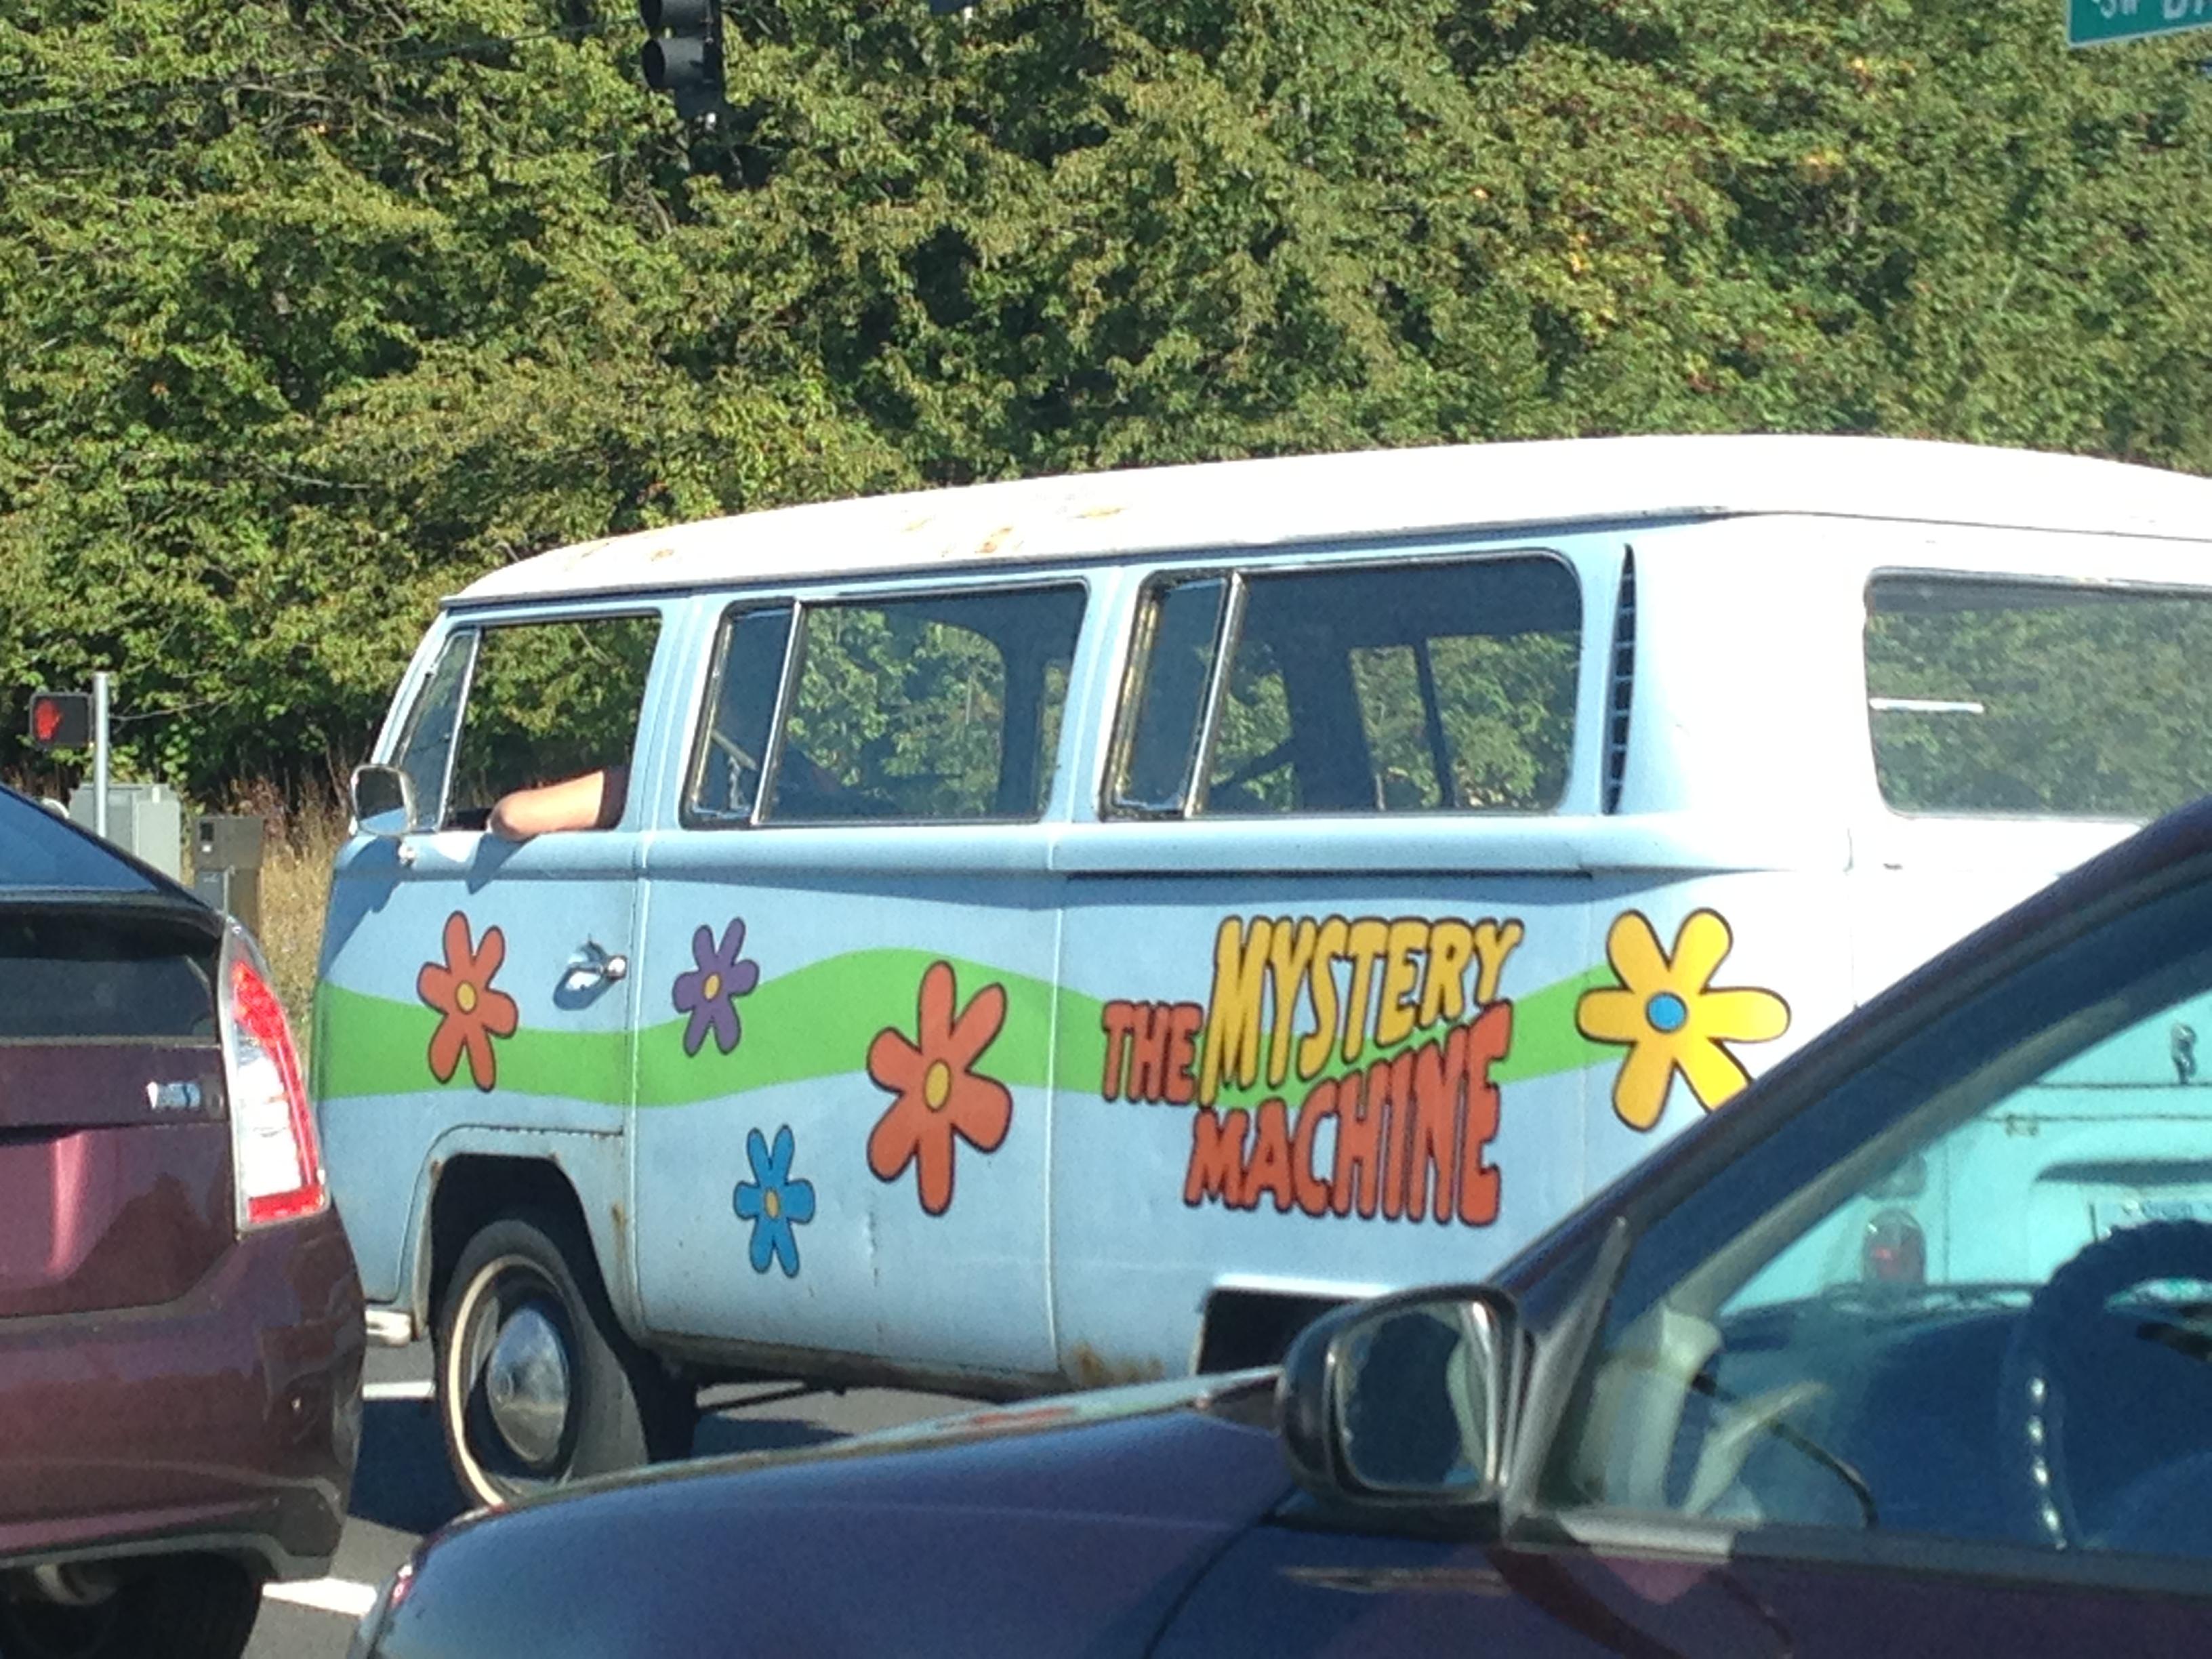 Portlandish: The Mystery Machine